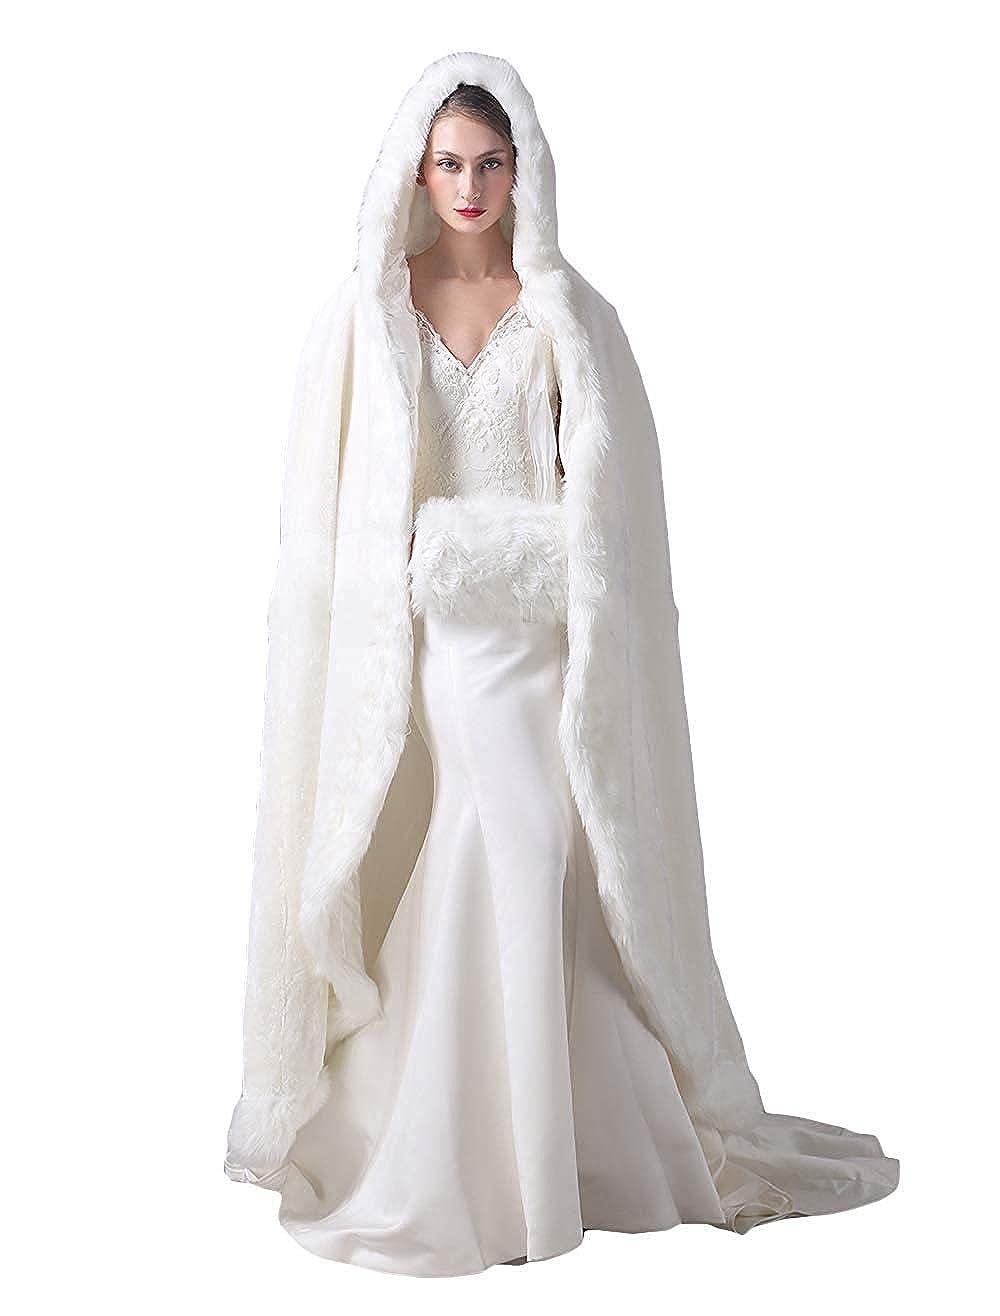 femme mariée chaude